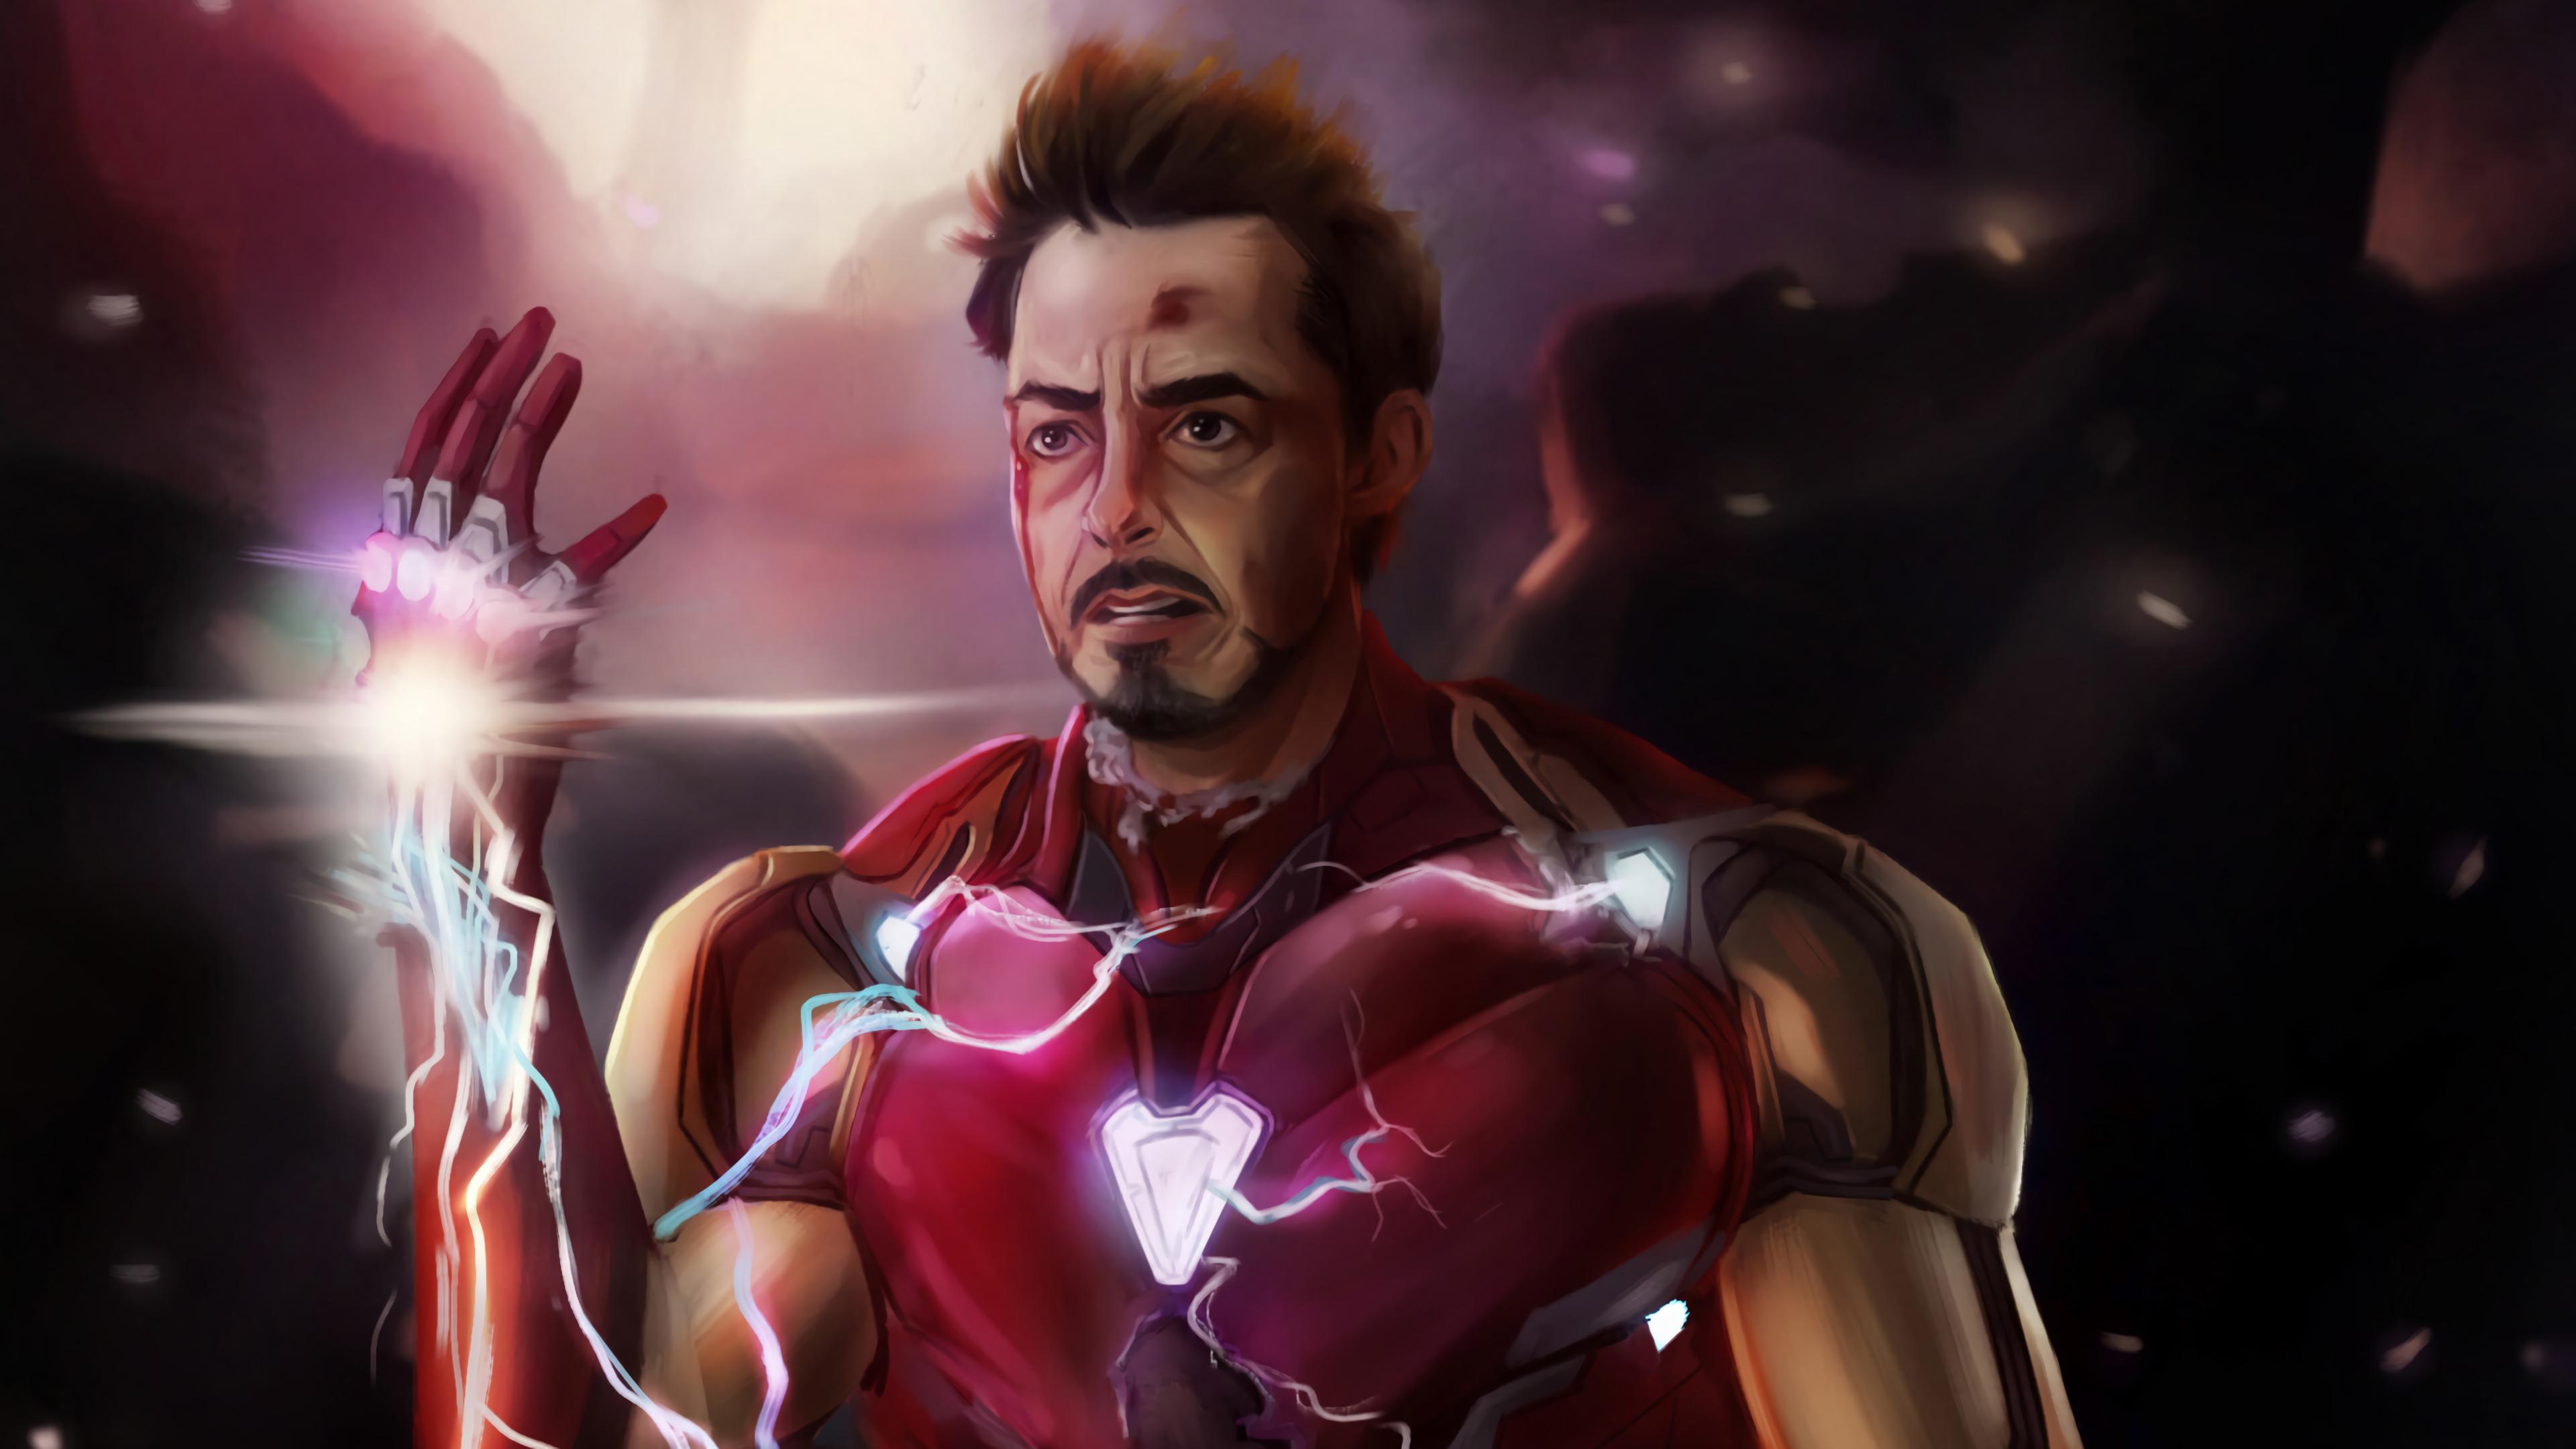 iron man 2019 new 1568054086 - Iron Man 2019 New - superheroes wallpapers, iron man wallpapers, hd-wallpapers, digital art wallpapers, artwork wallpapers, 4k-wallpapers